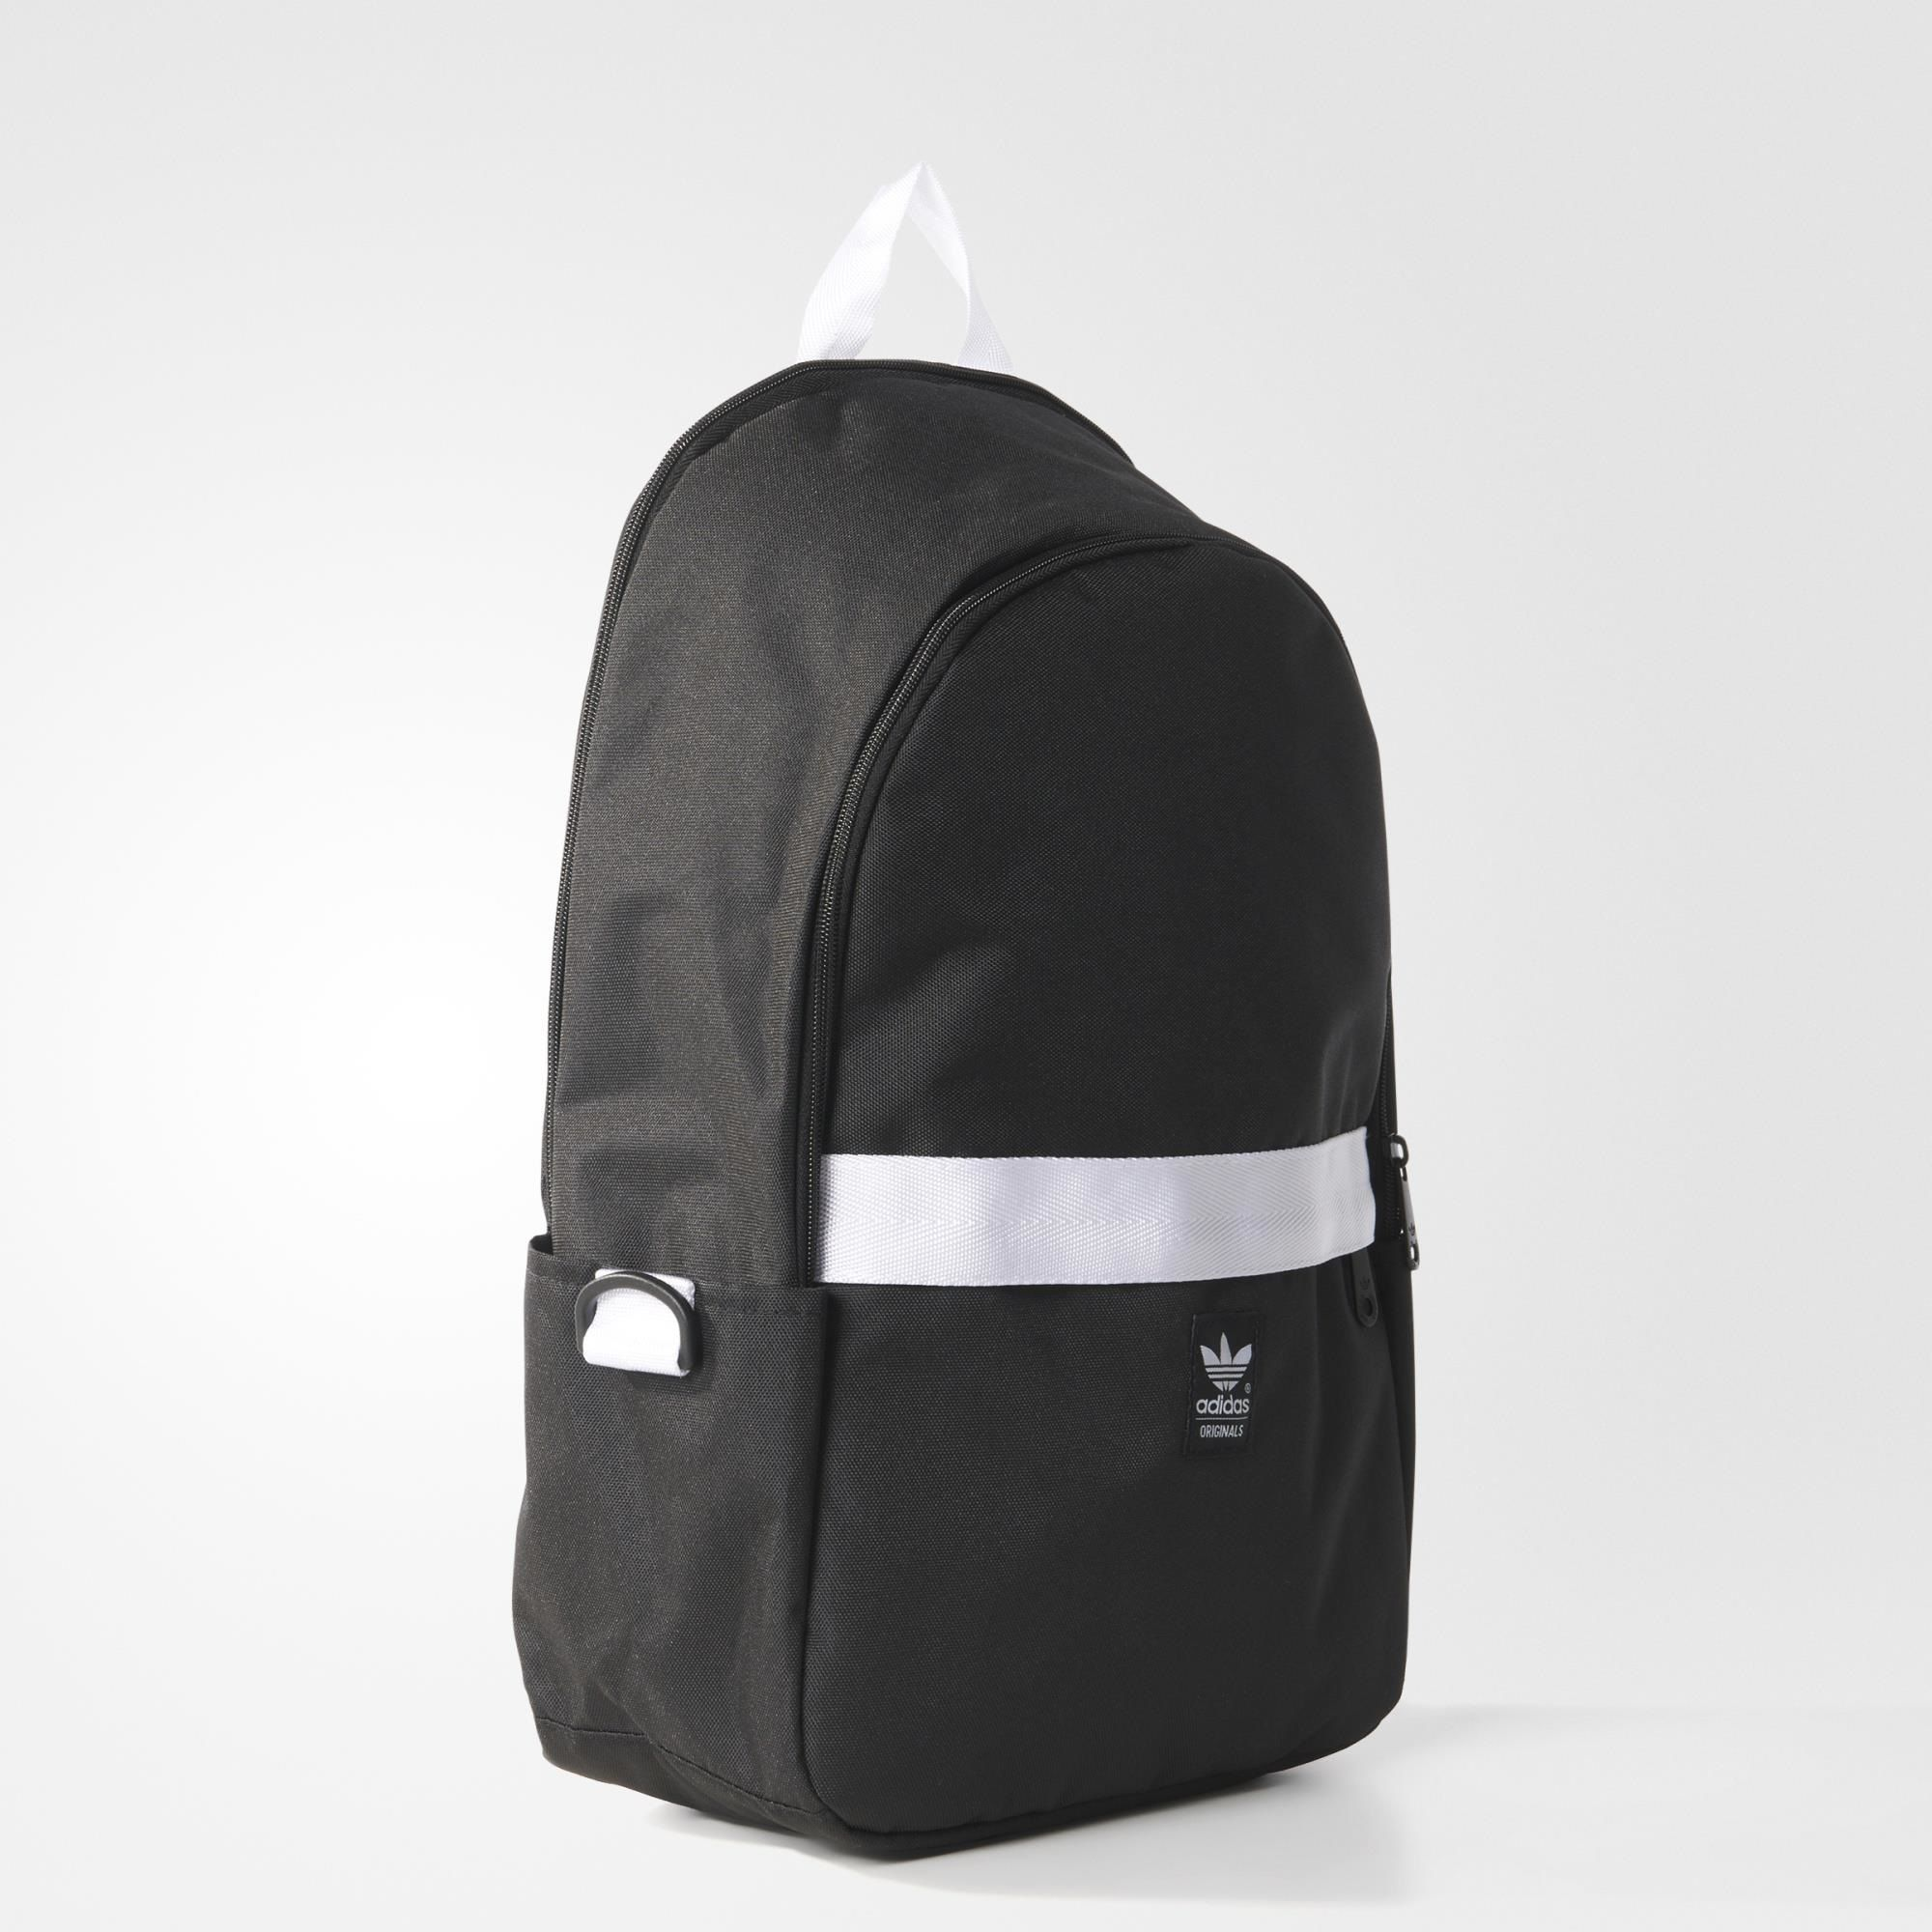 adidas - rucksack rucksäcke pinterest schwarzen rucksack, rucksäcke.